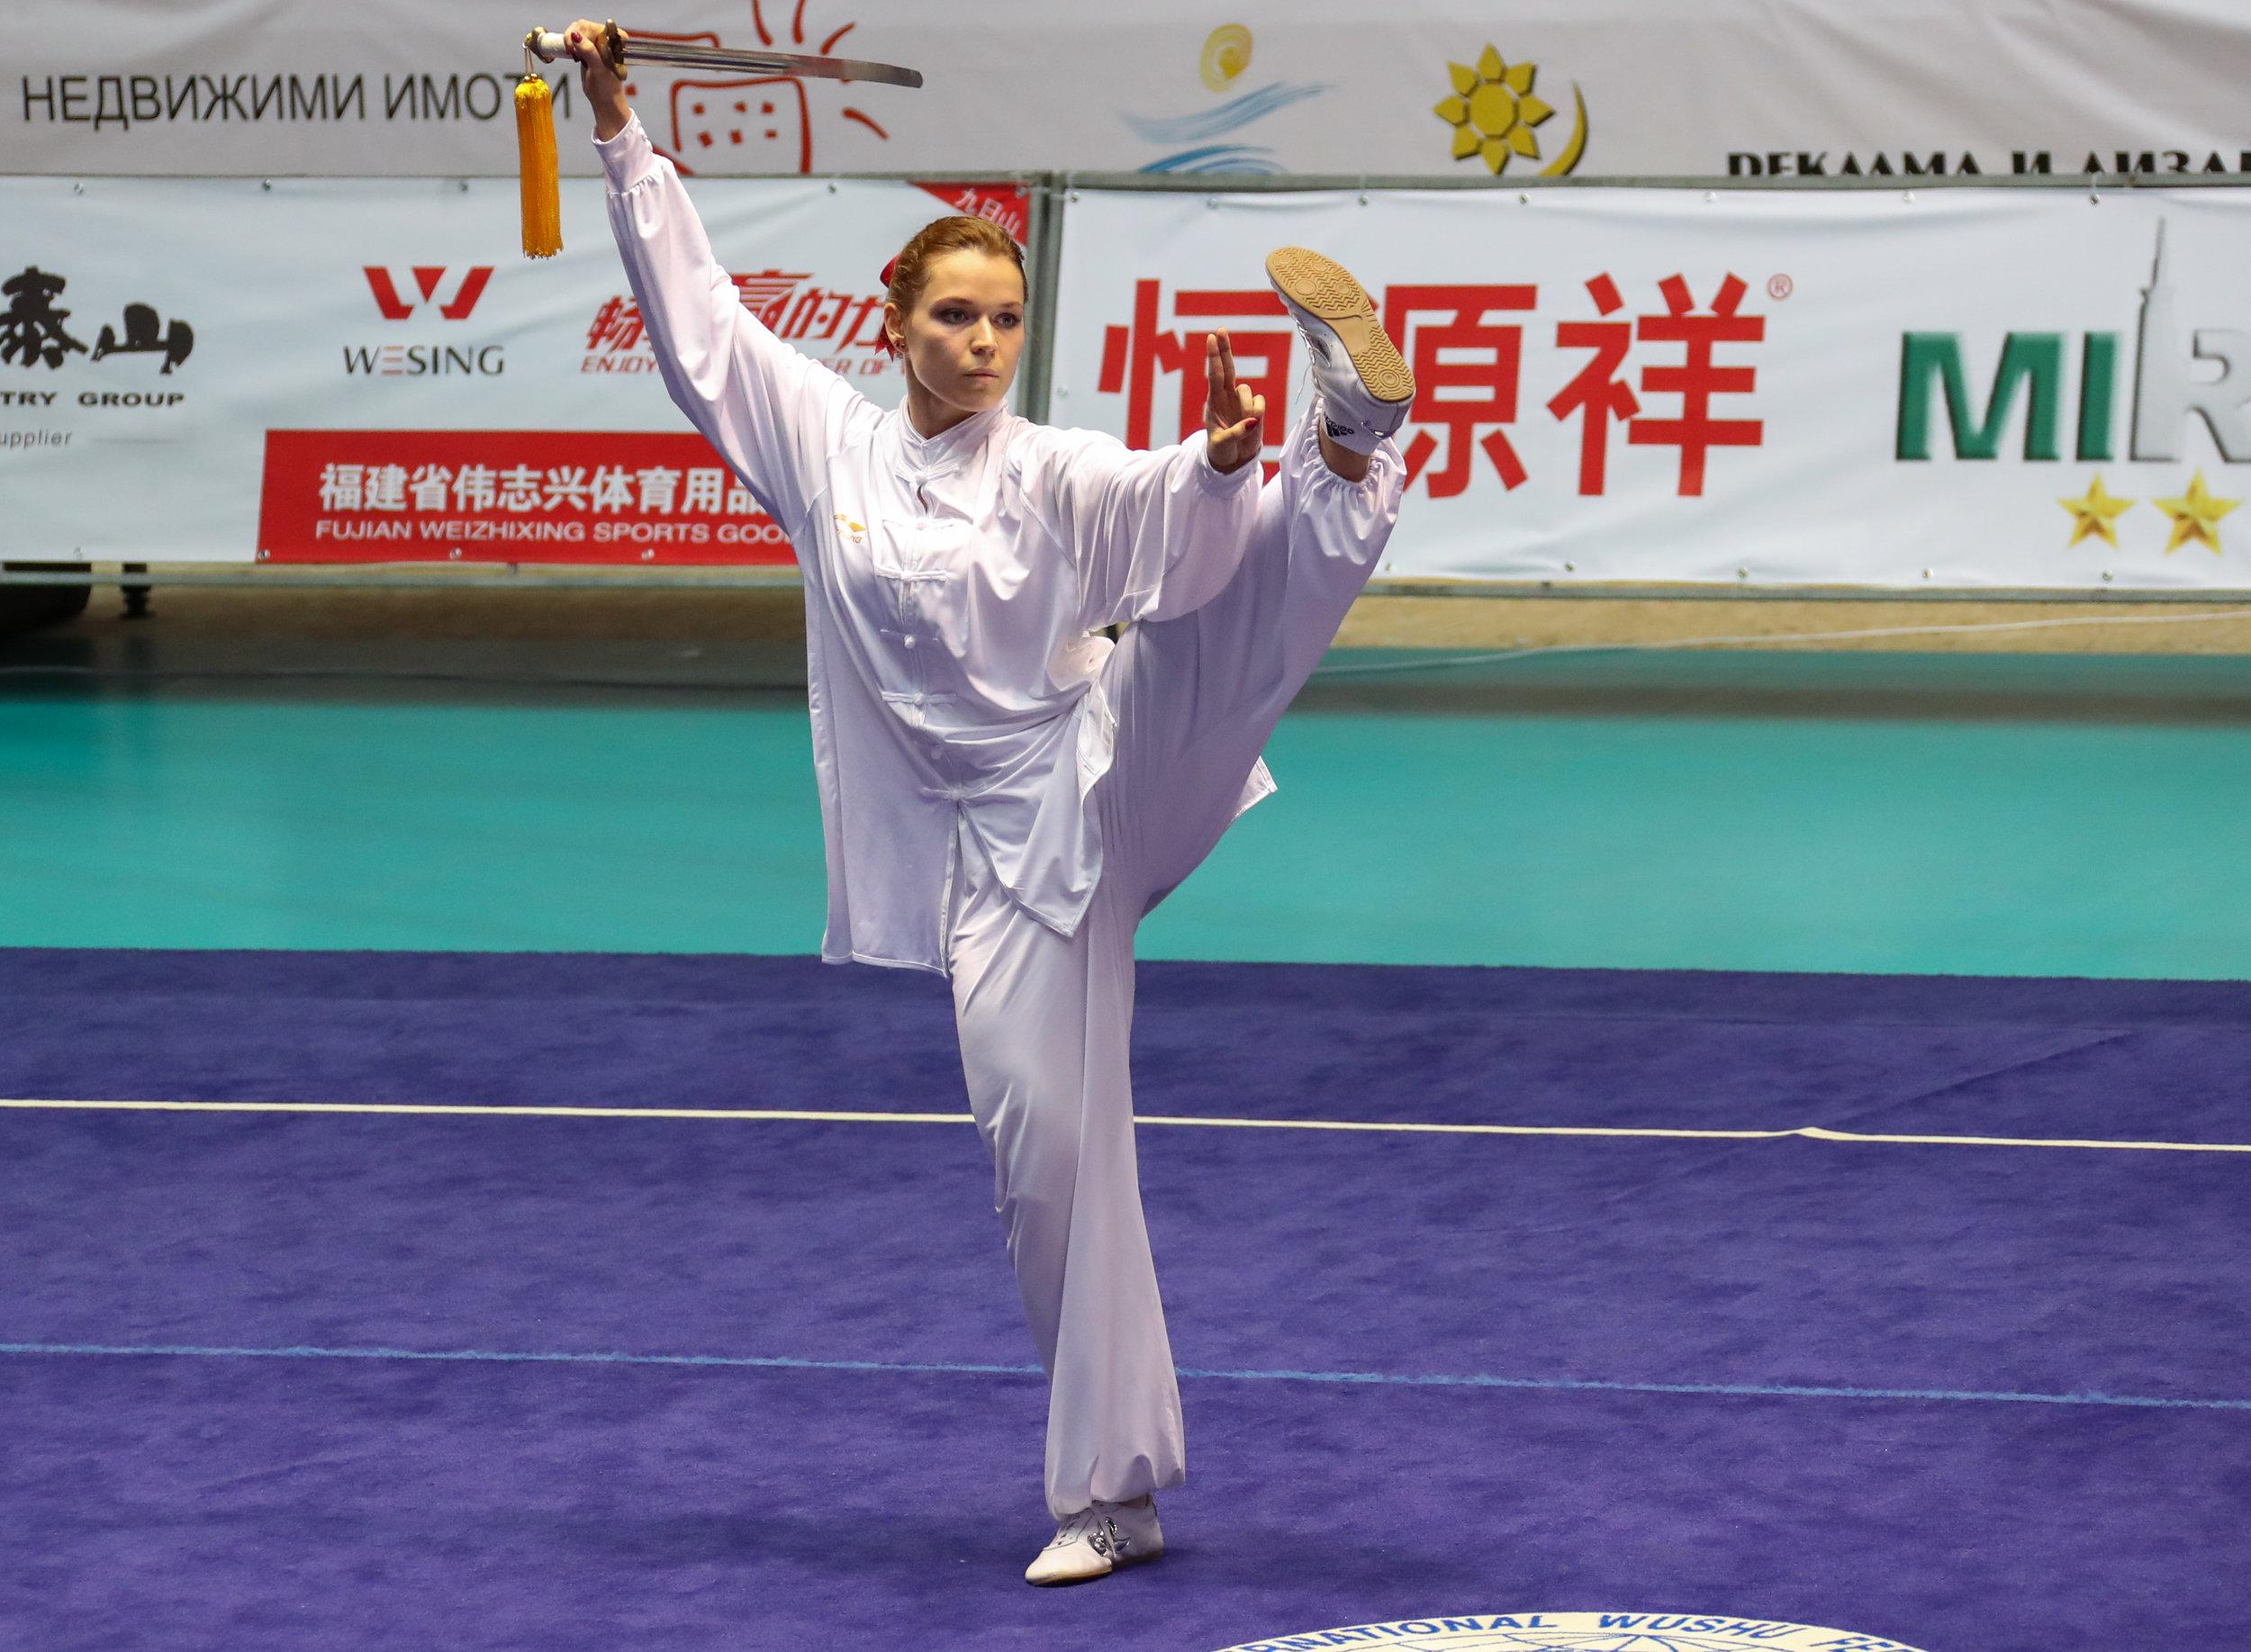 3. Mistrzostwa Świata Taijiquan, Yang Taijijian (forma standaryzowana).jpg